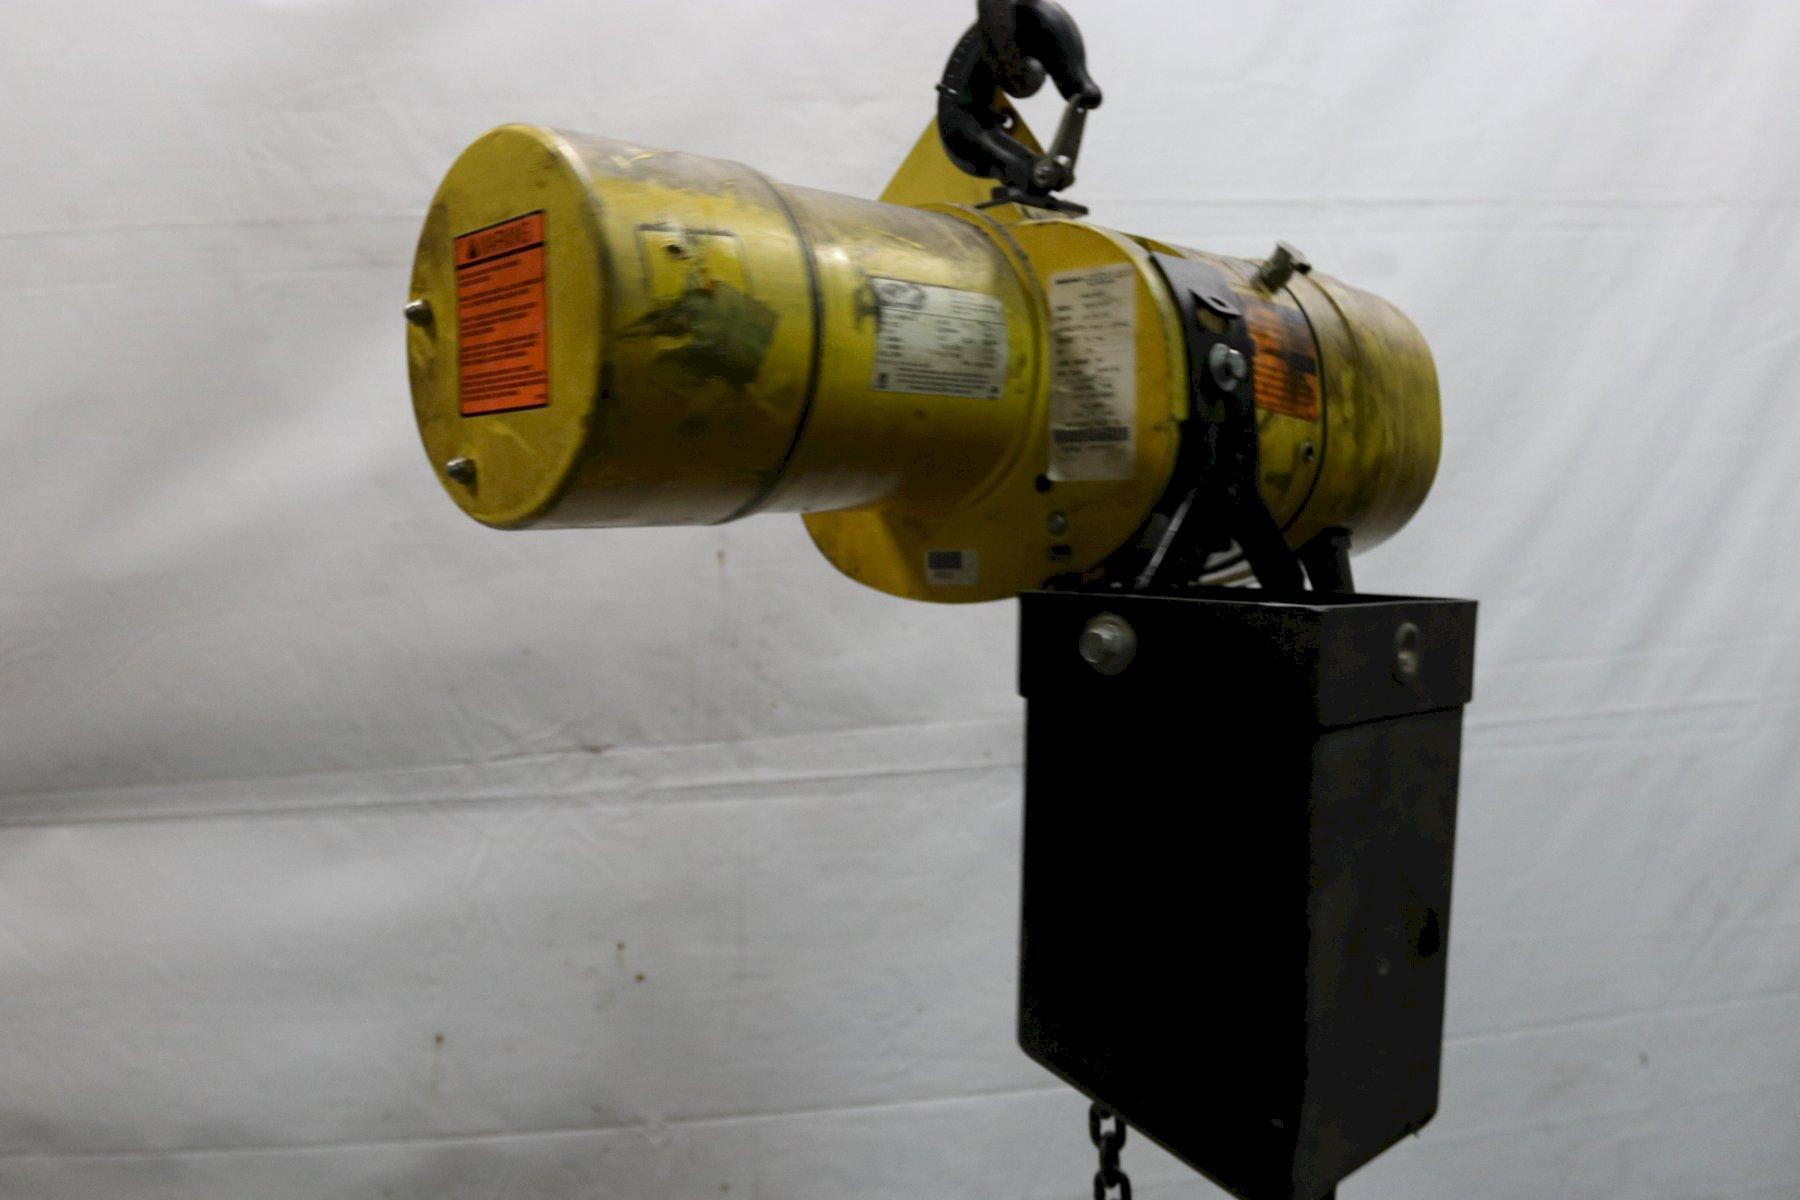 500 LB BUDGIT MODEL #BEHC2516 ELECTRIC POWERED CHAIN HOIST:   STOCK #11986